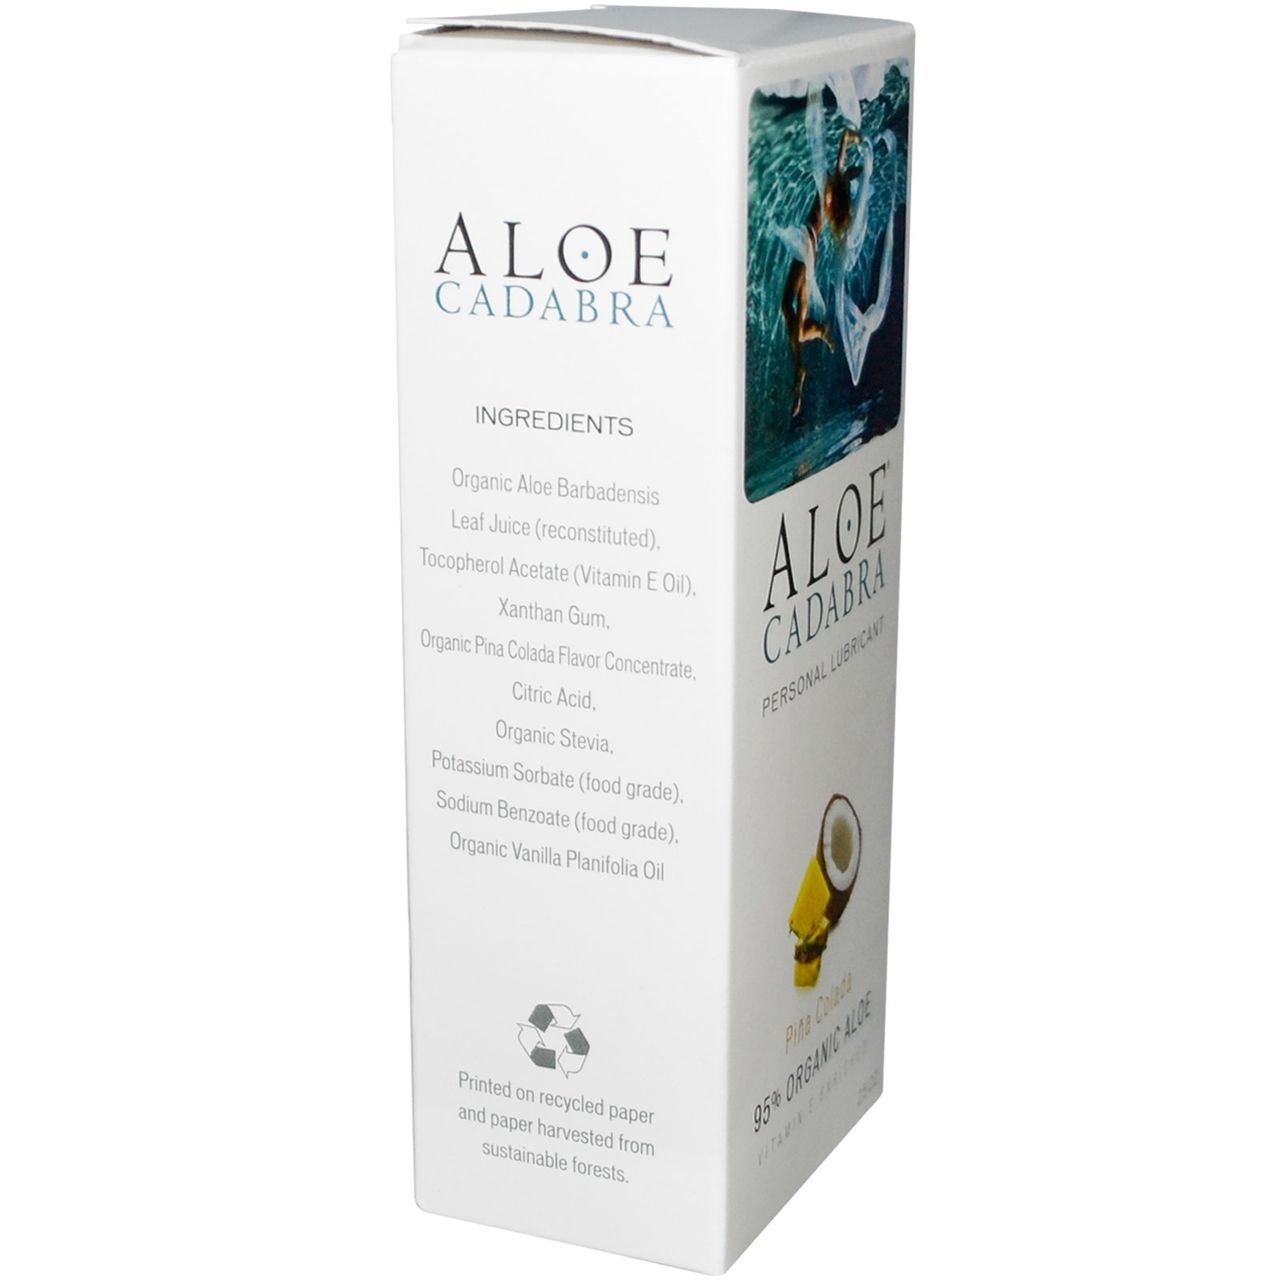 Aloe Cadabra Personal Pleasure Lube and Best Natural Vaginal Moisturizer Lubricant with 95% Organic Aloe Vera, Edible Flavored - Pina Colada, 2.5 Ounce